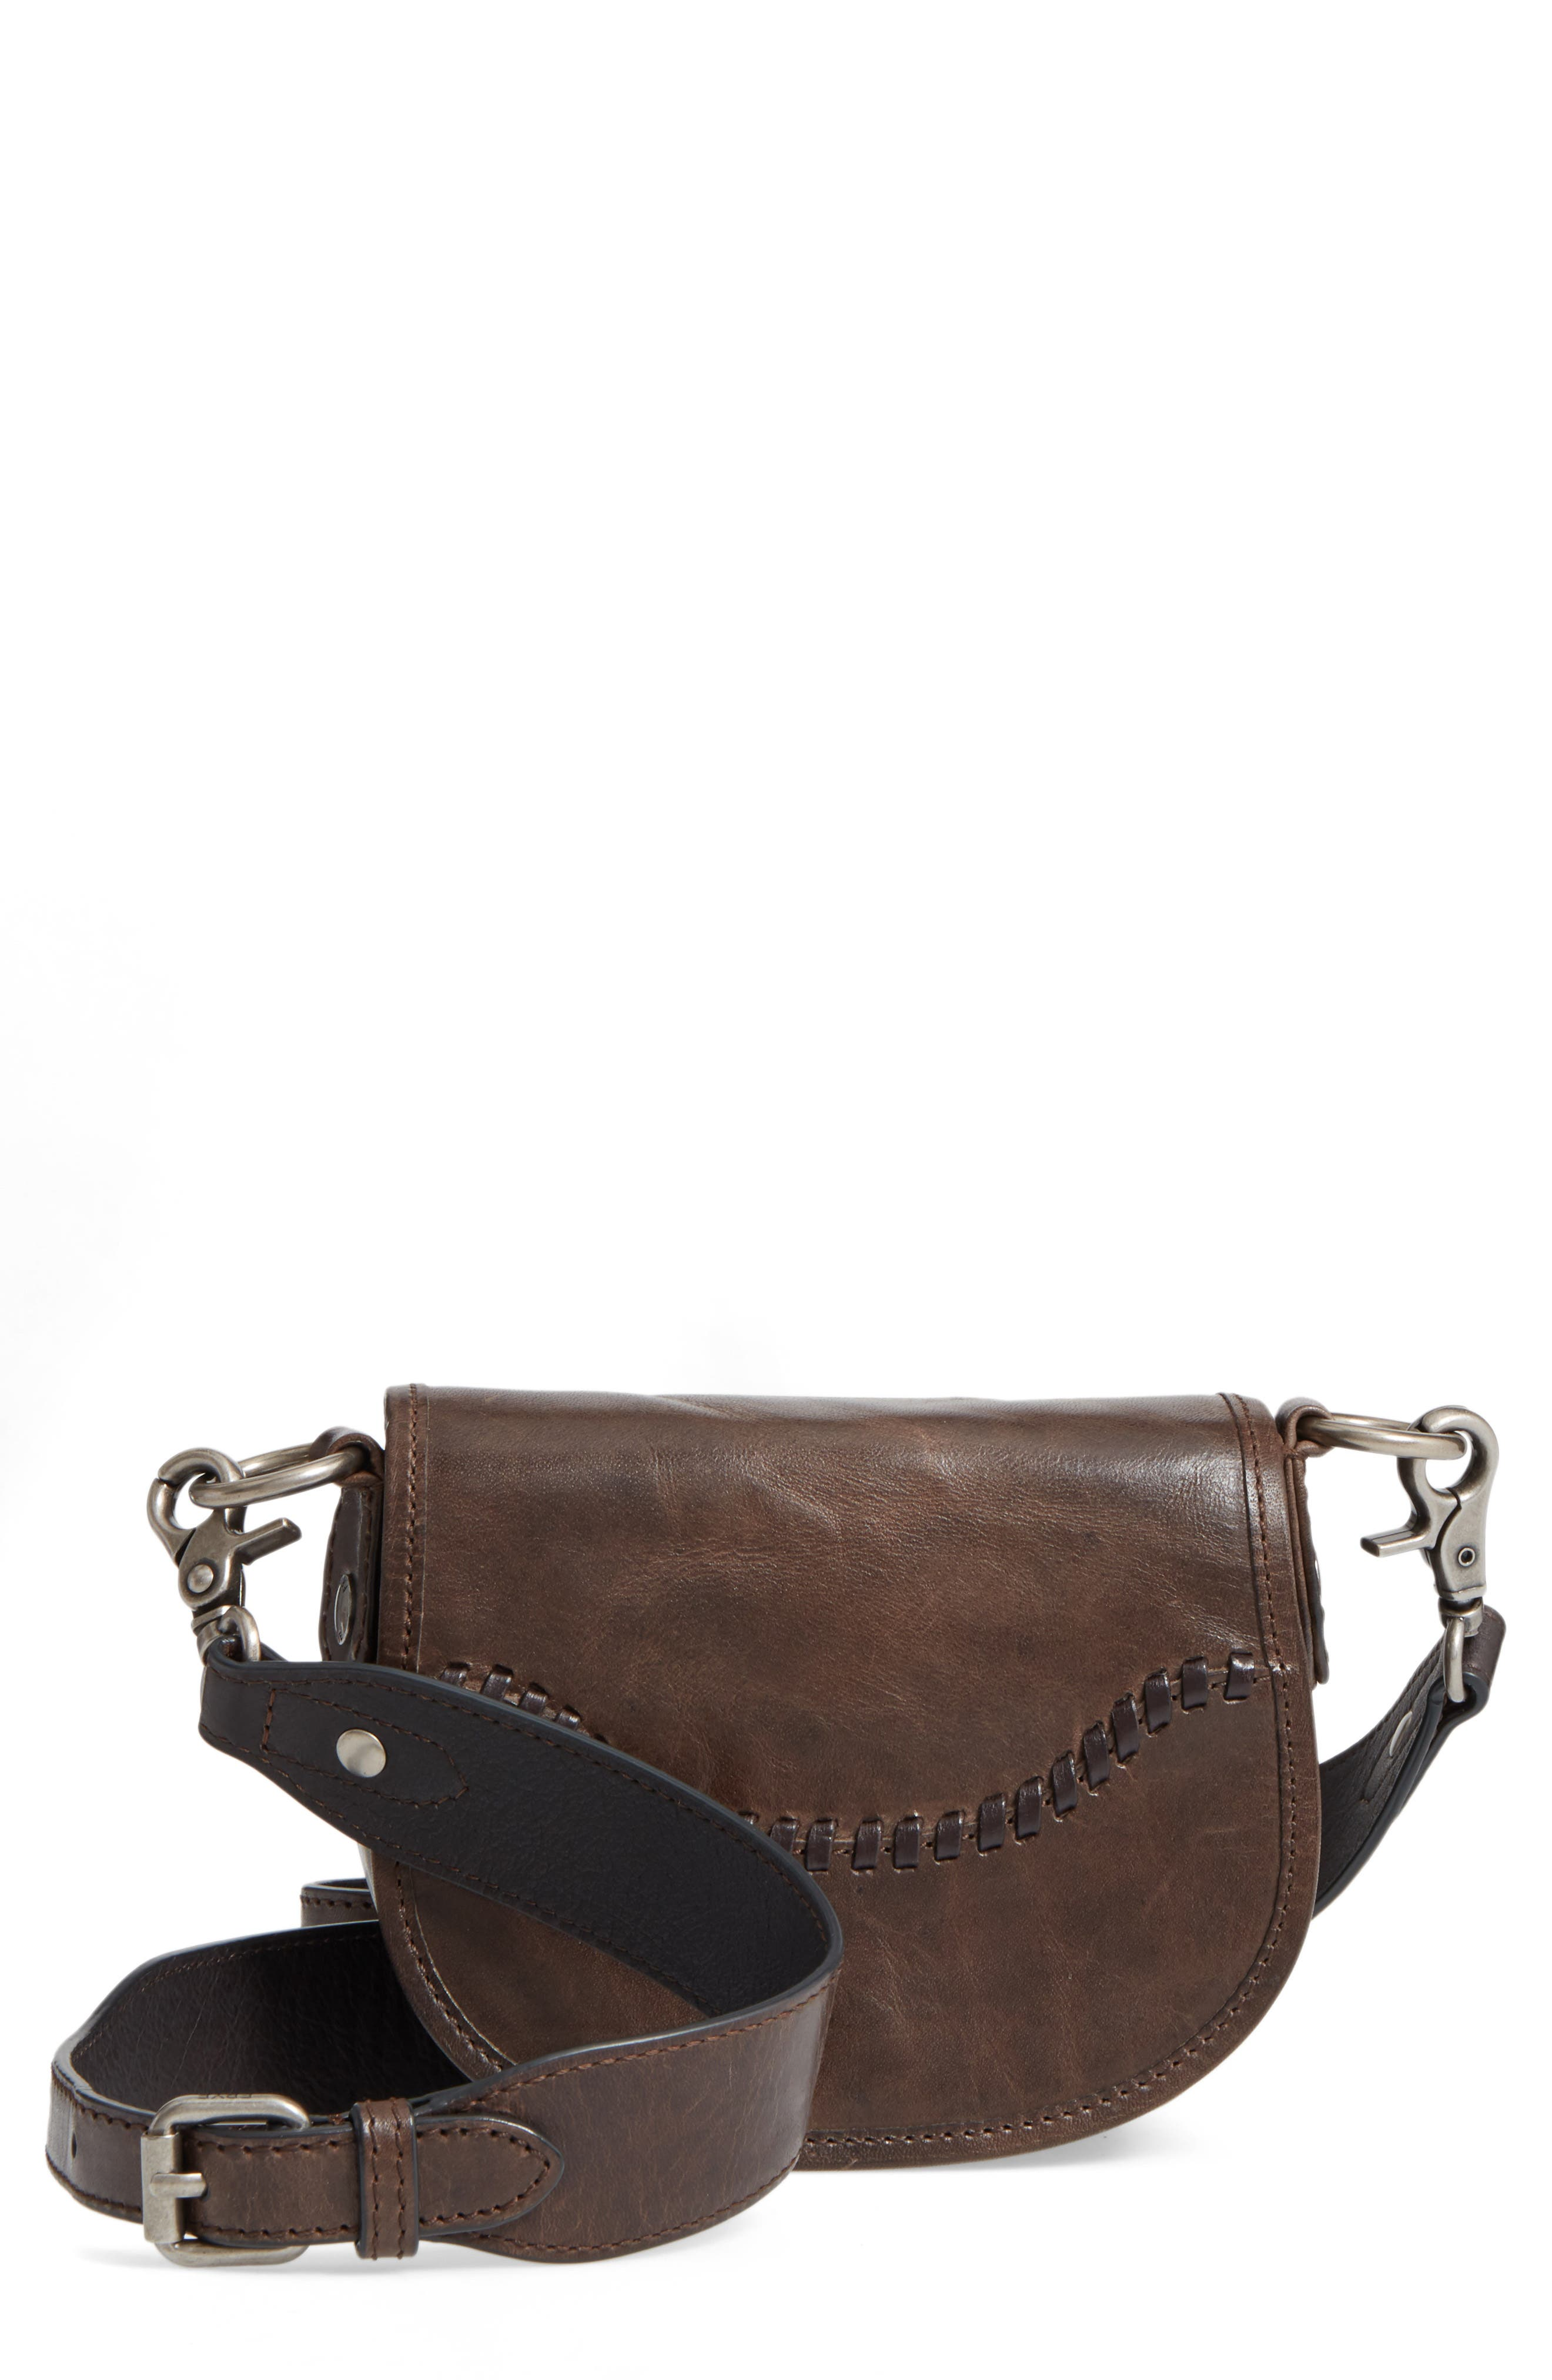 Mini Melissa Whipstitch Leather Saddle Bag,                             Main thumbnail 1, color,                             203